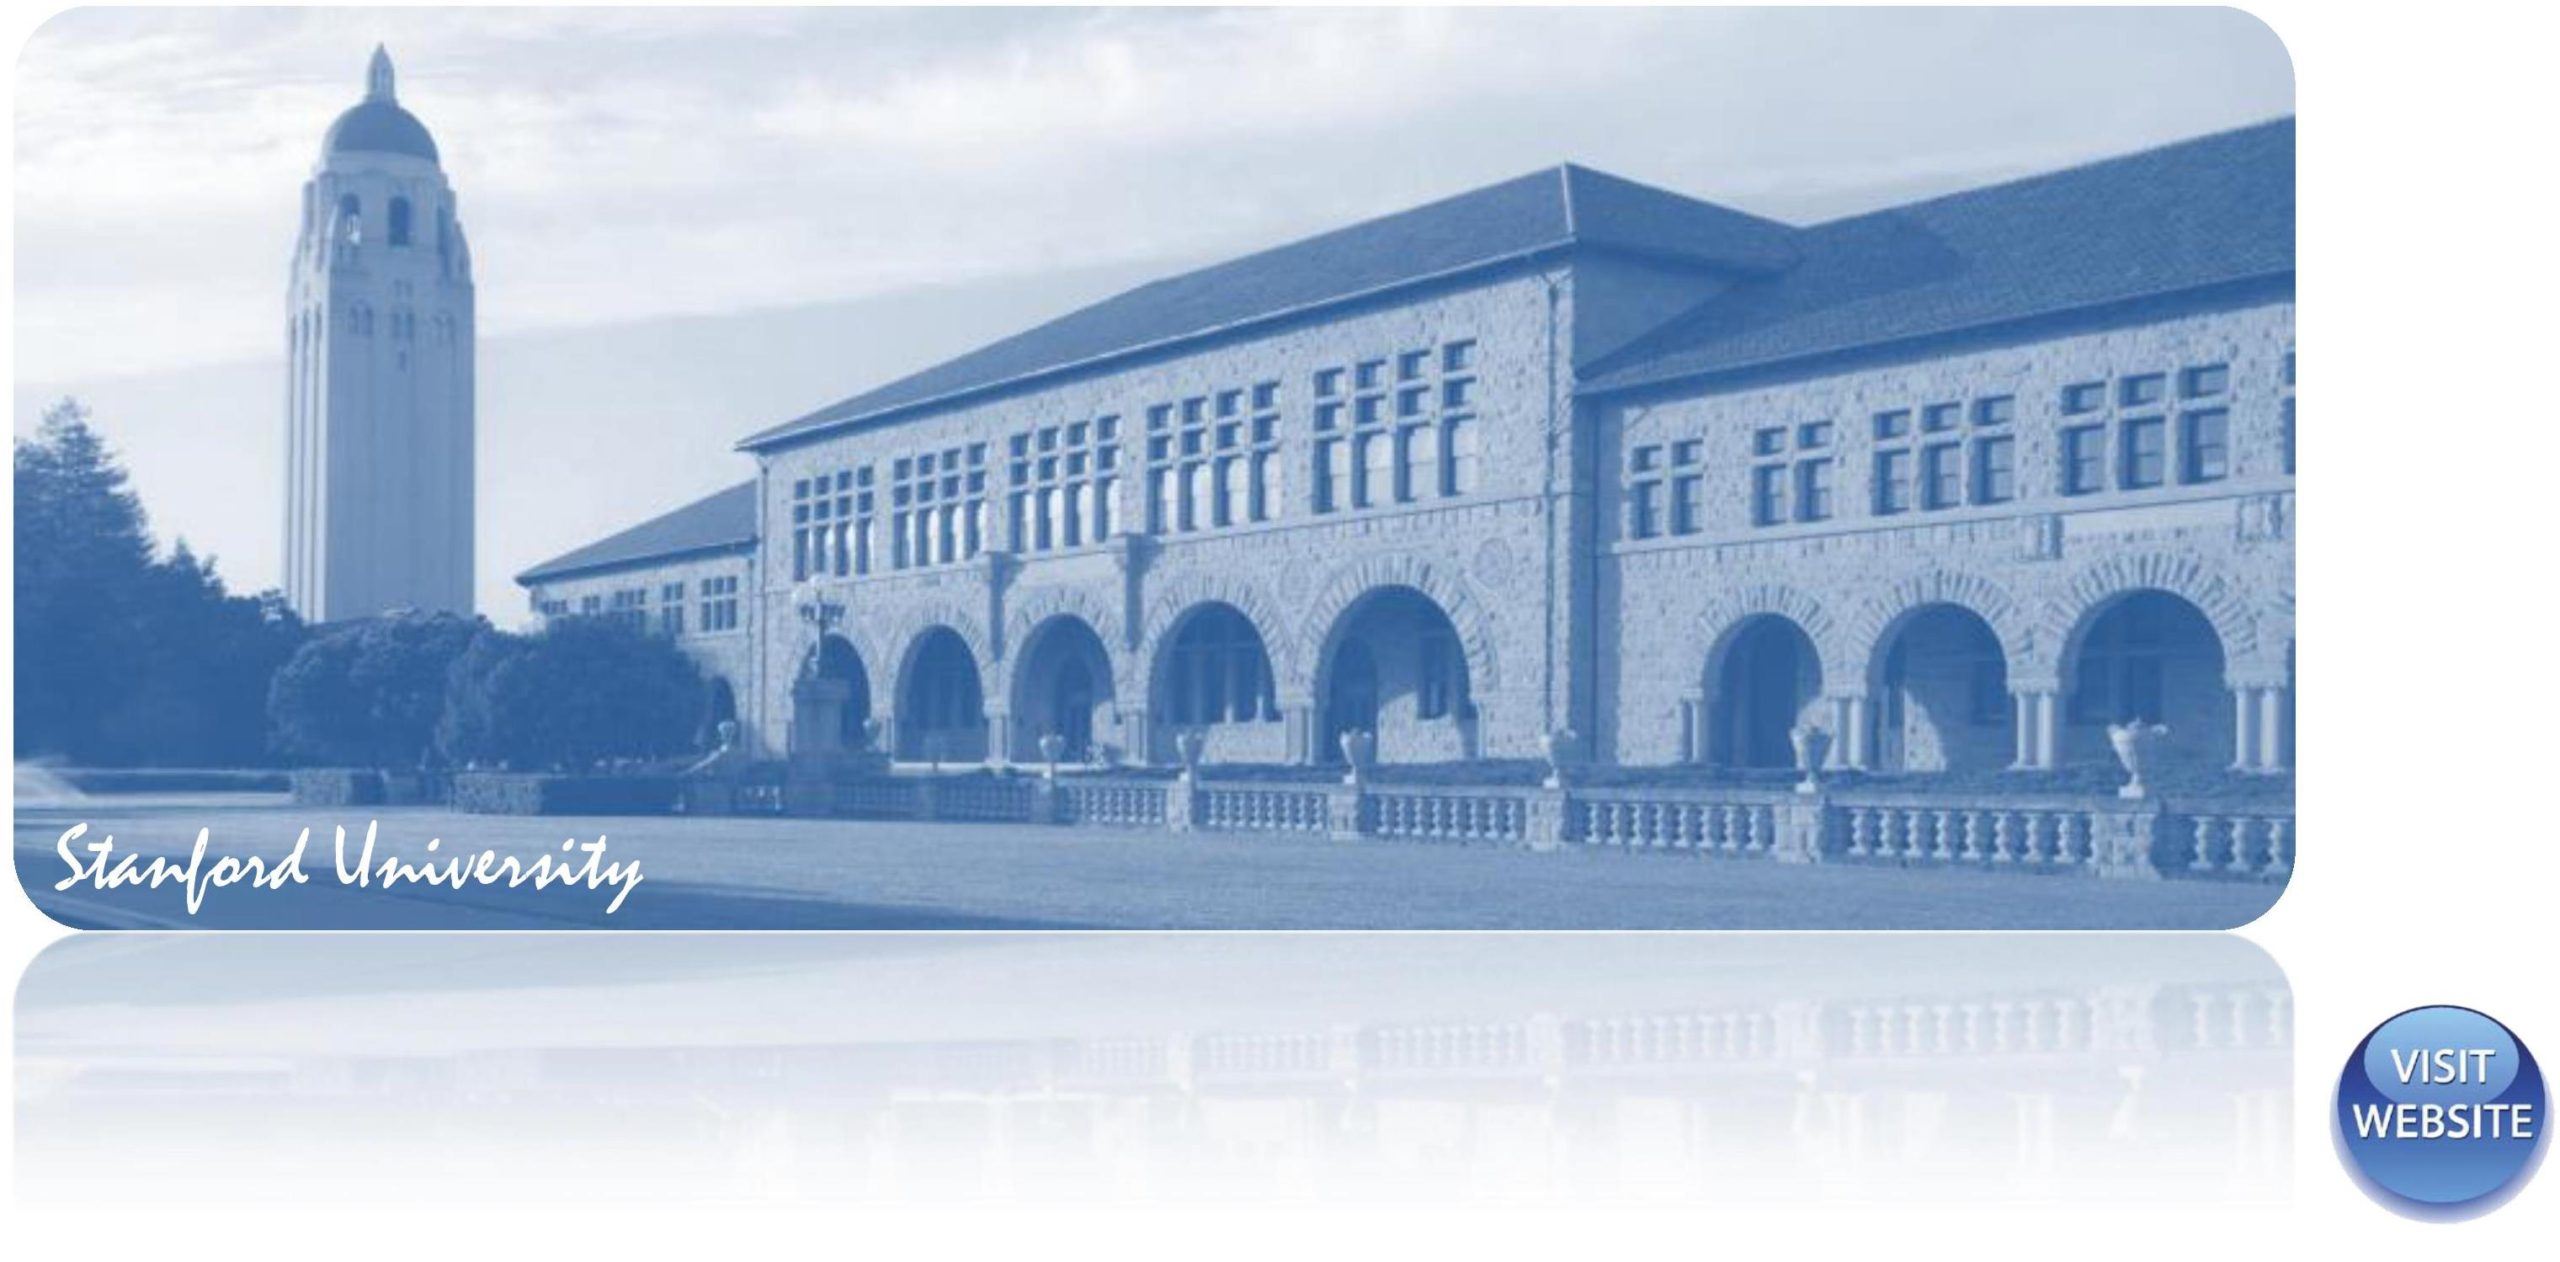 Stanford University USA